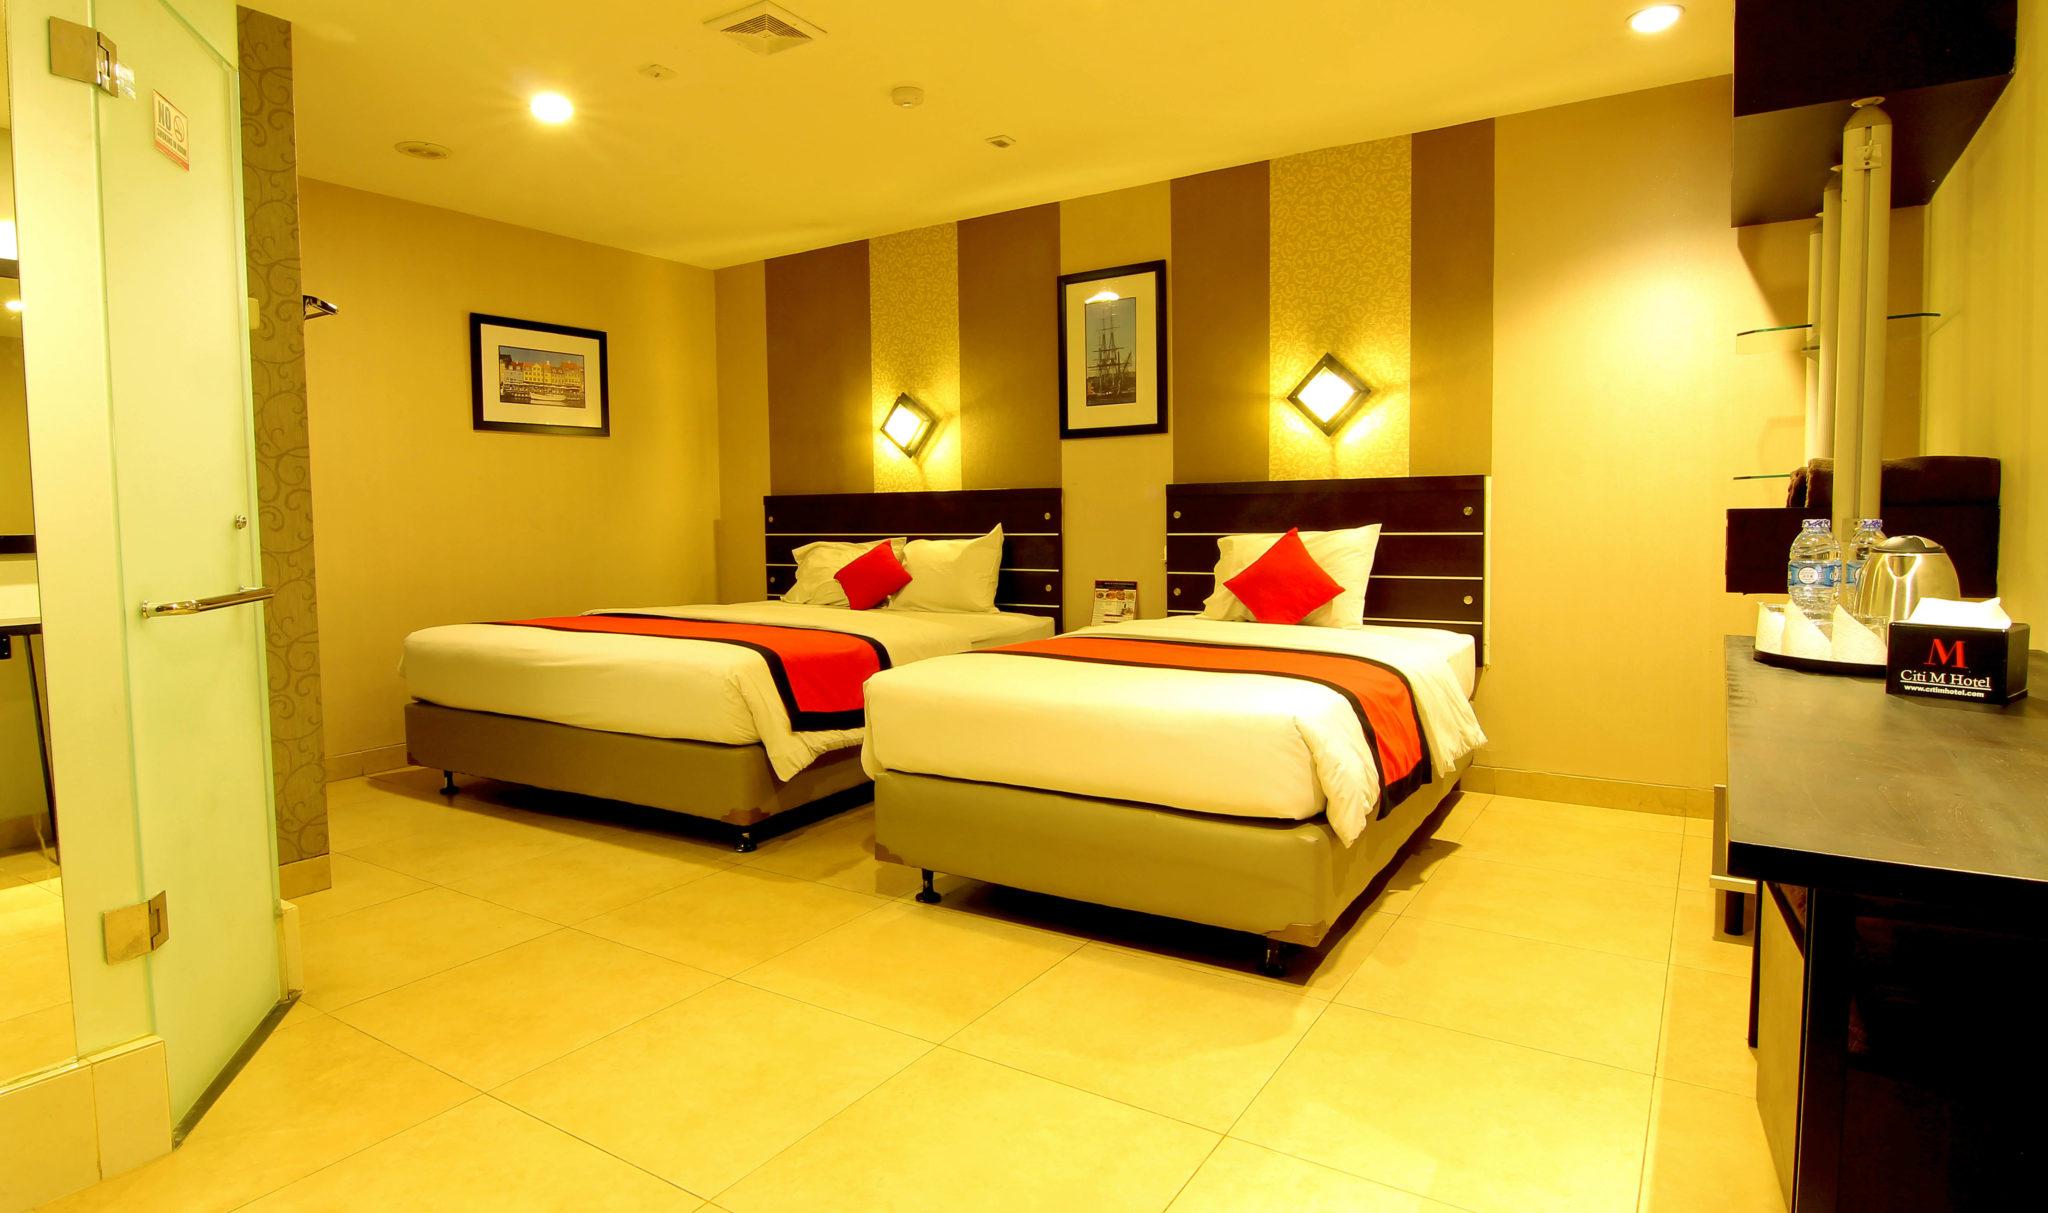 Citi M Hotel Gambir - Family Room